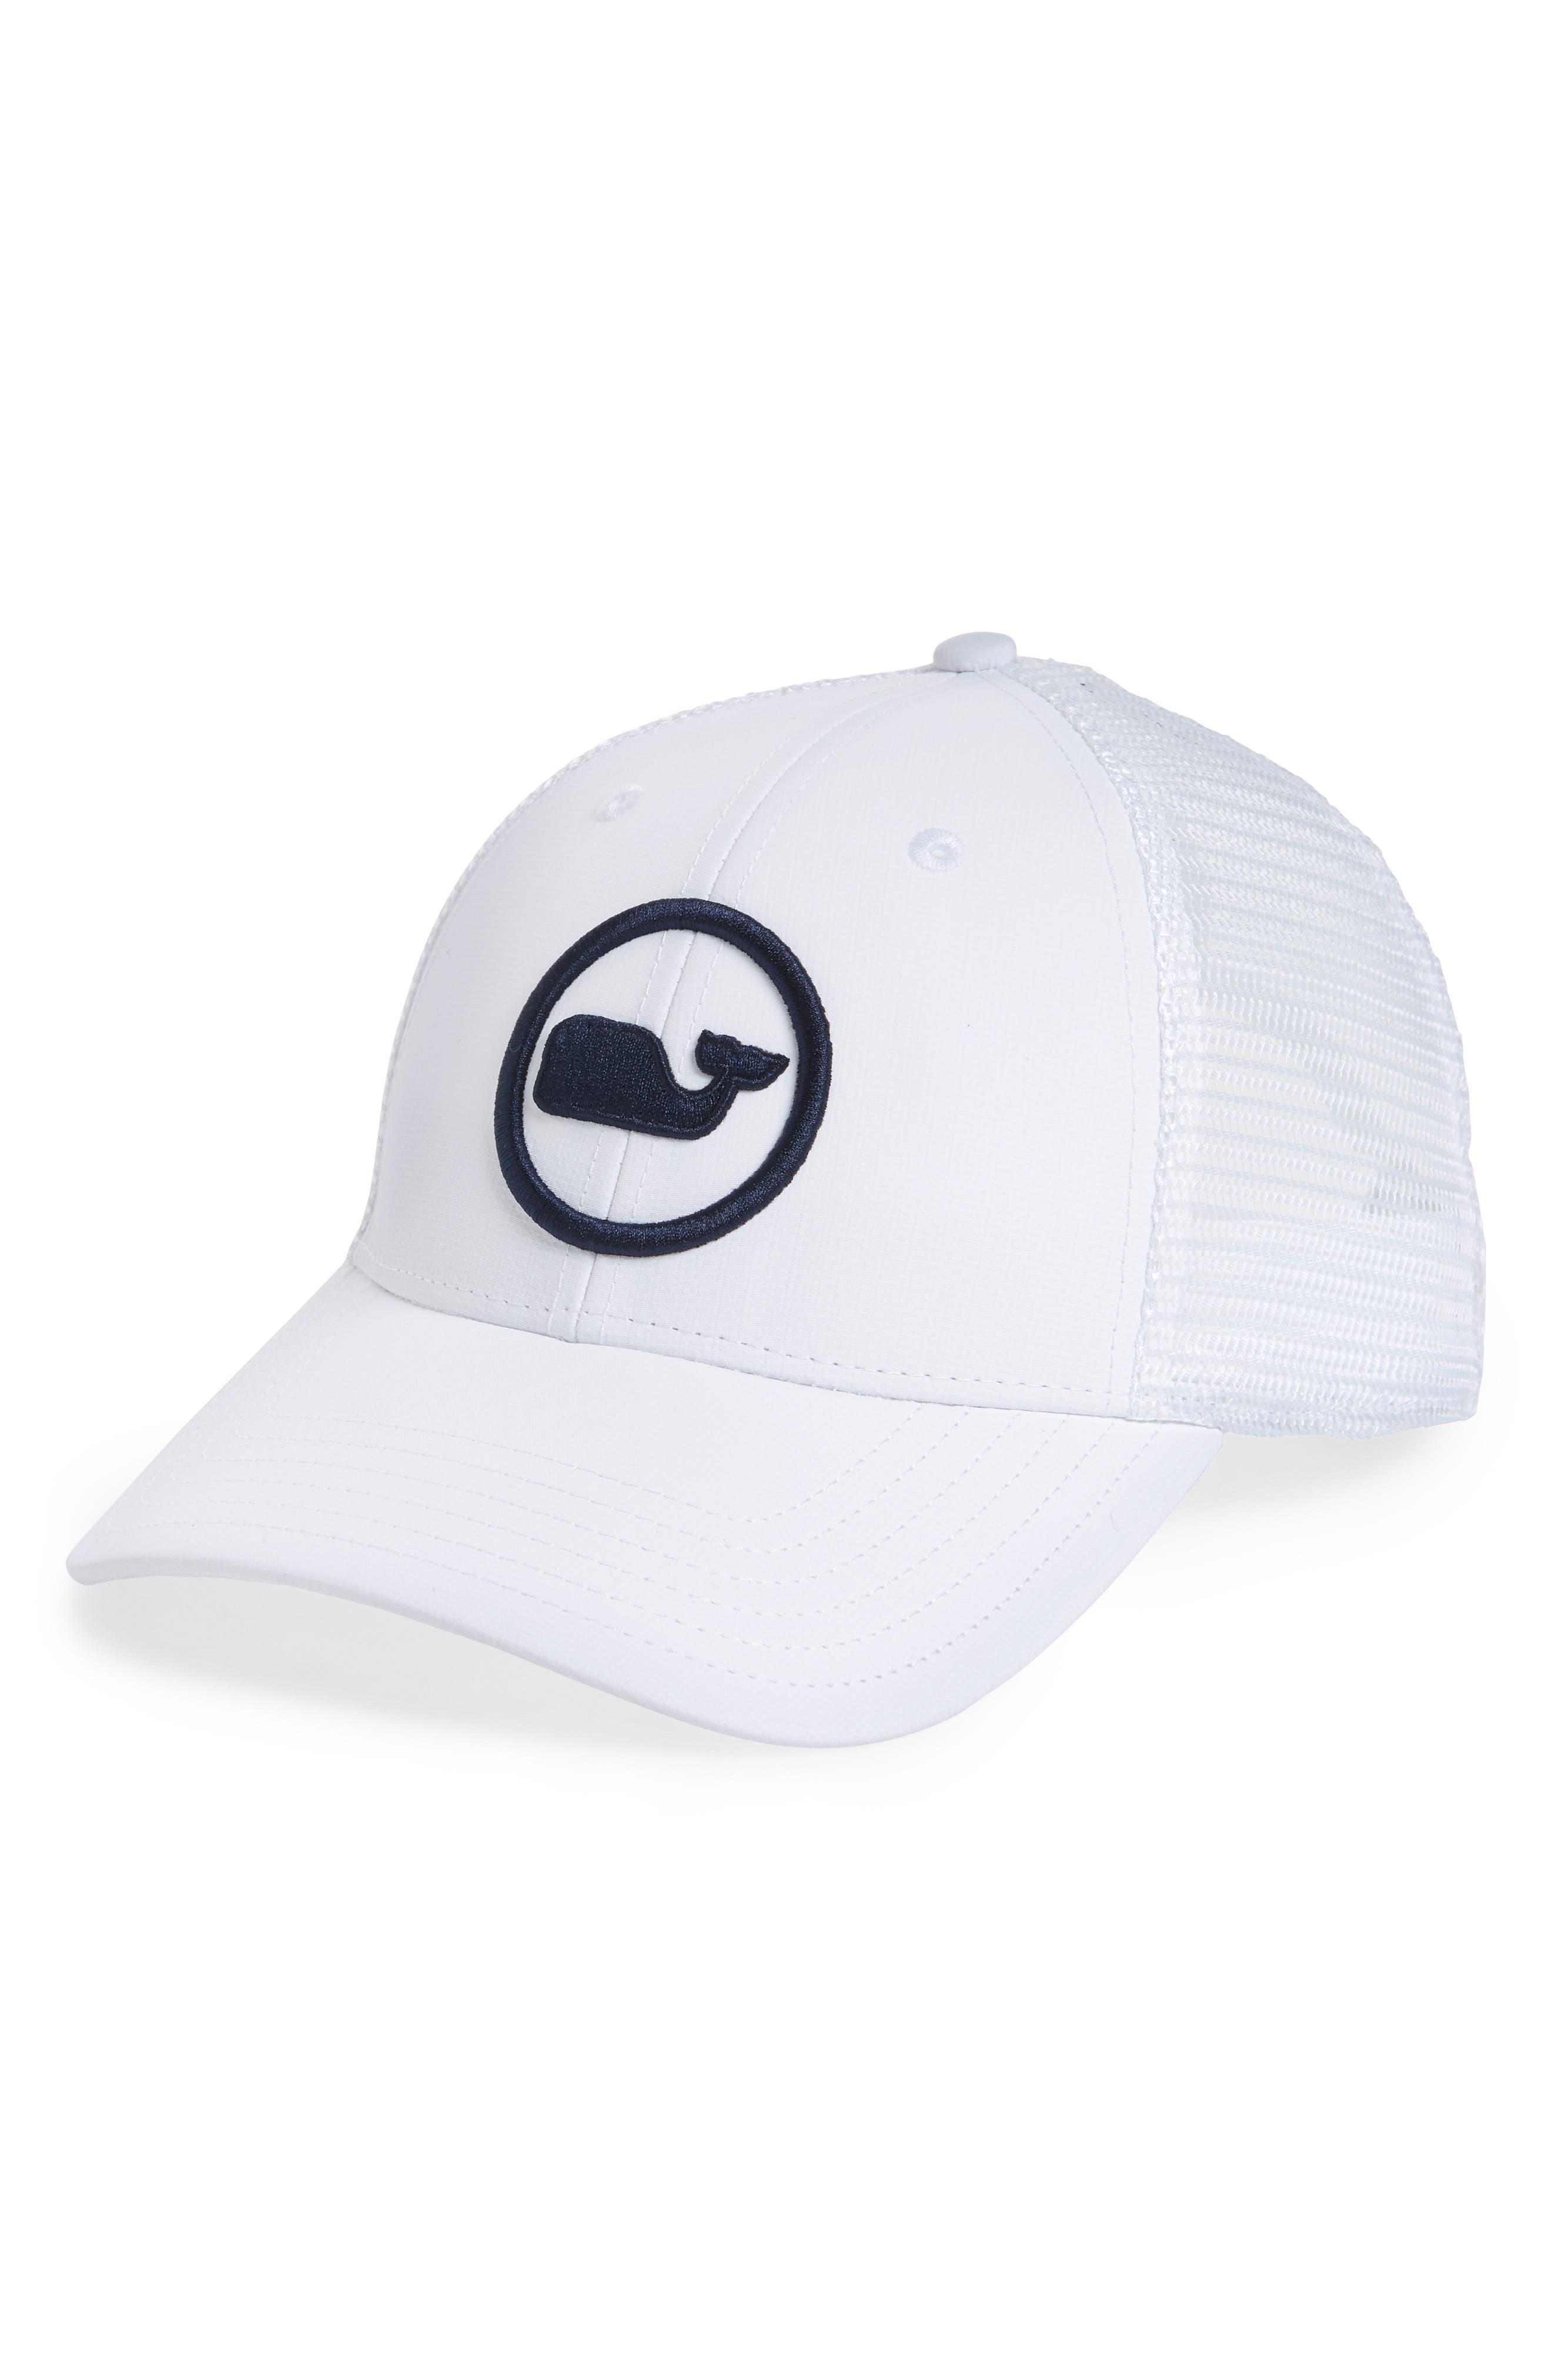 VINEYARD VINES Whale Dot Trucker Cap - White ab6236aad934